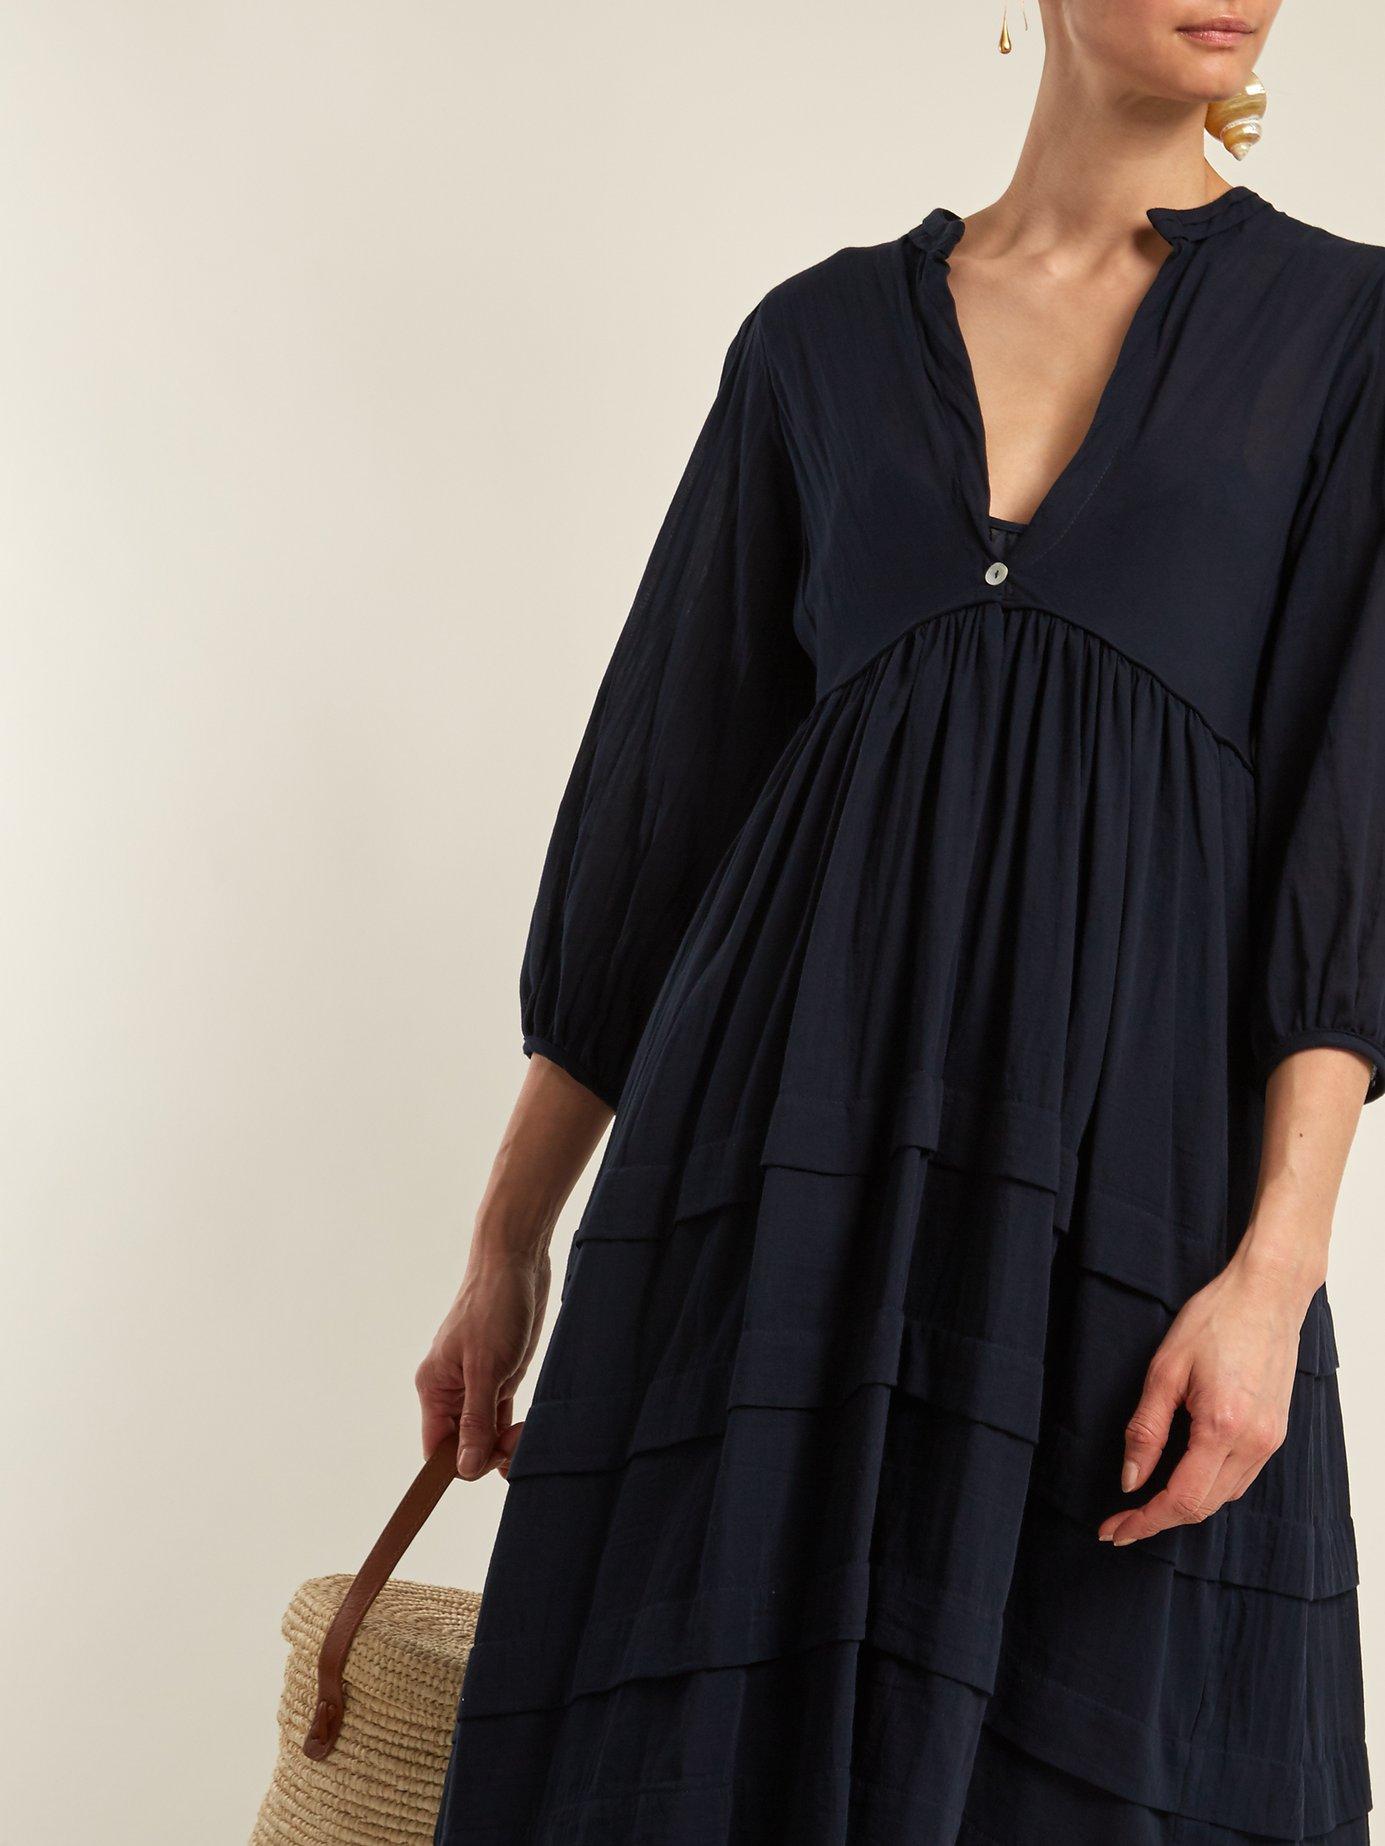 Nova cotton dress by Loup Charmant